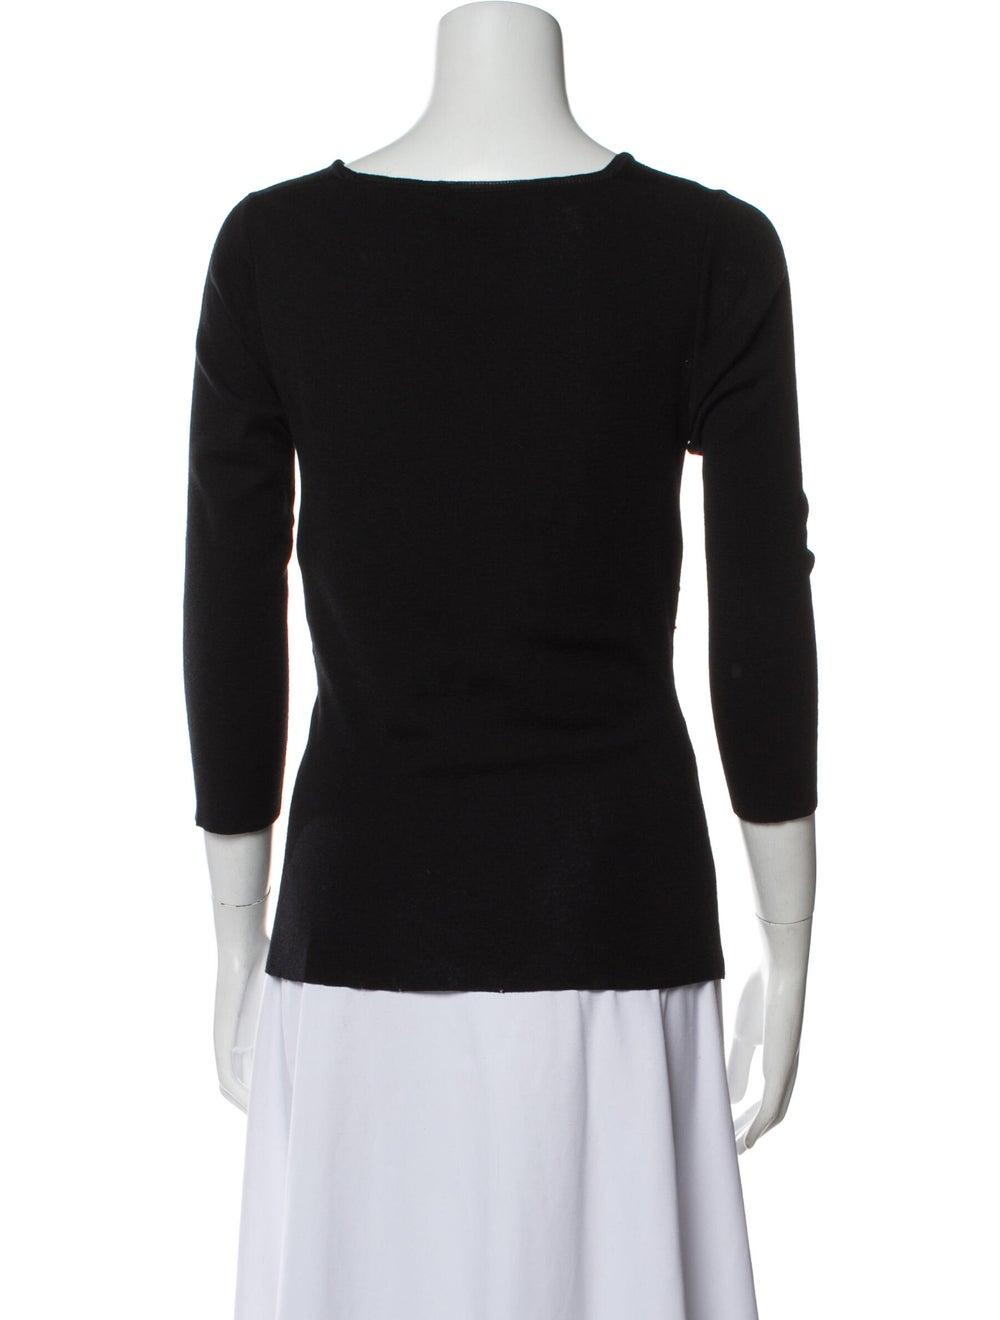 Prada Wool V-Neck Top Wool - image 3